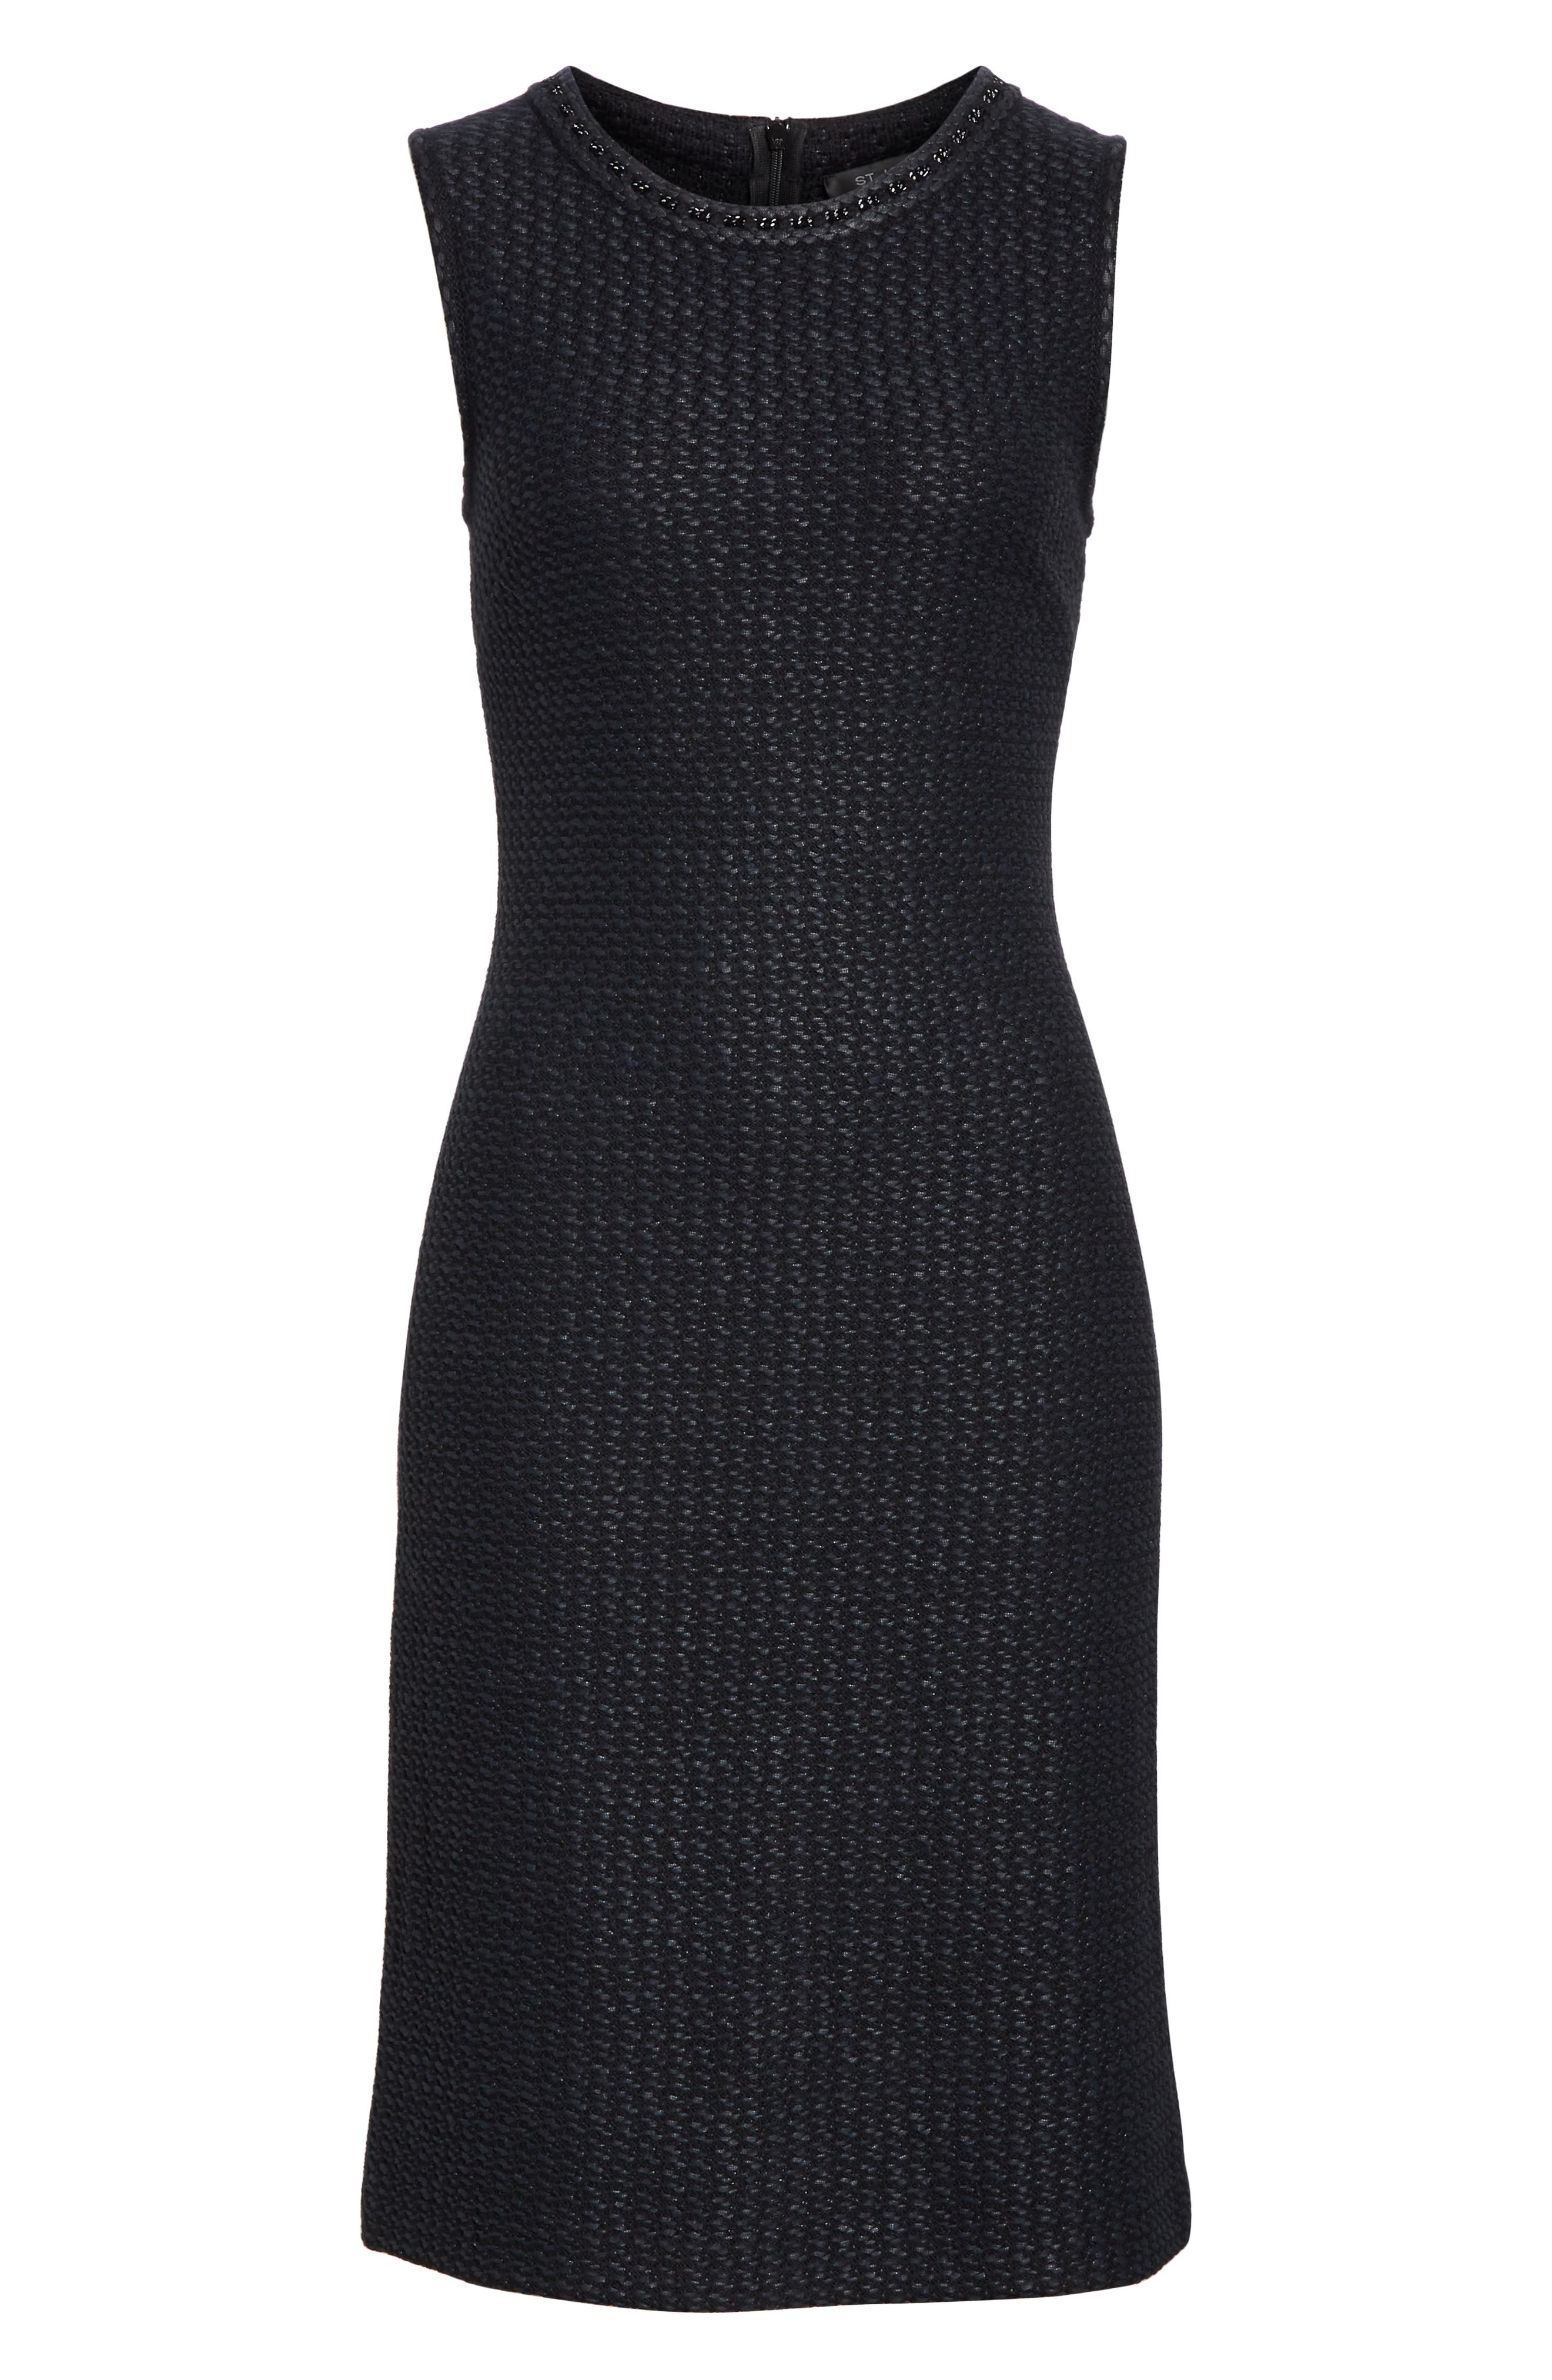 ST. JOHN COLLECTION, Adina Chain Trim Knit Dress, Alternate thumbnail 7, color, CAVIAR